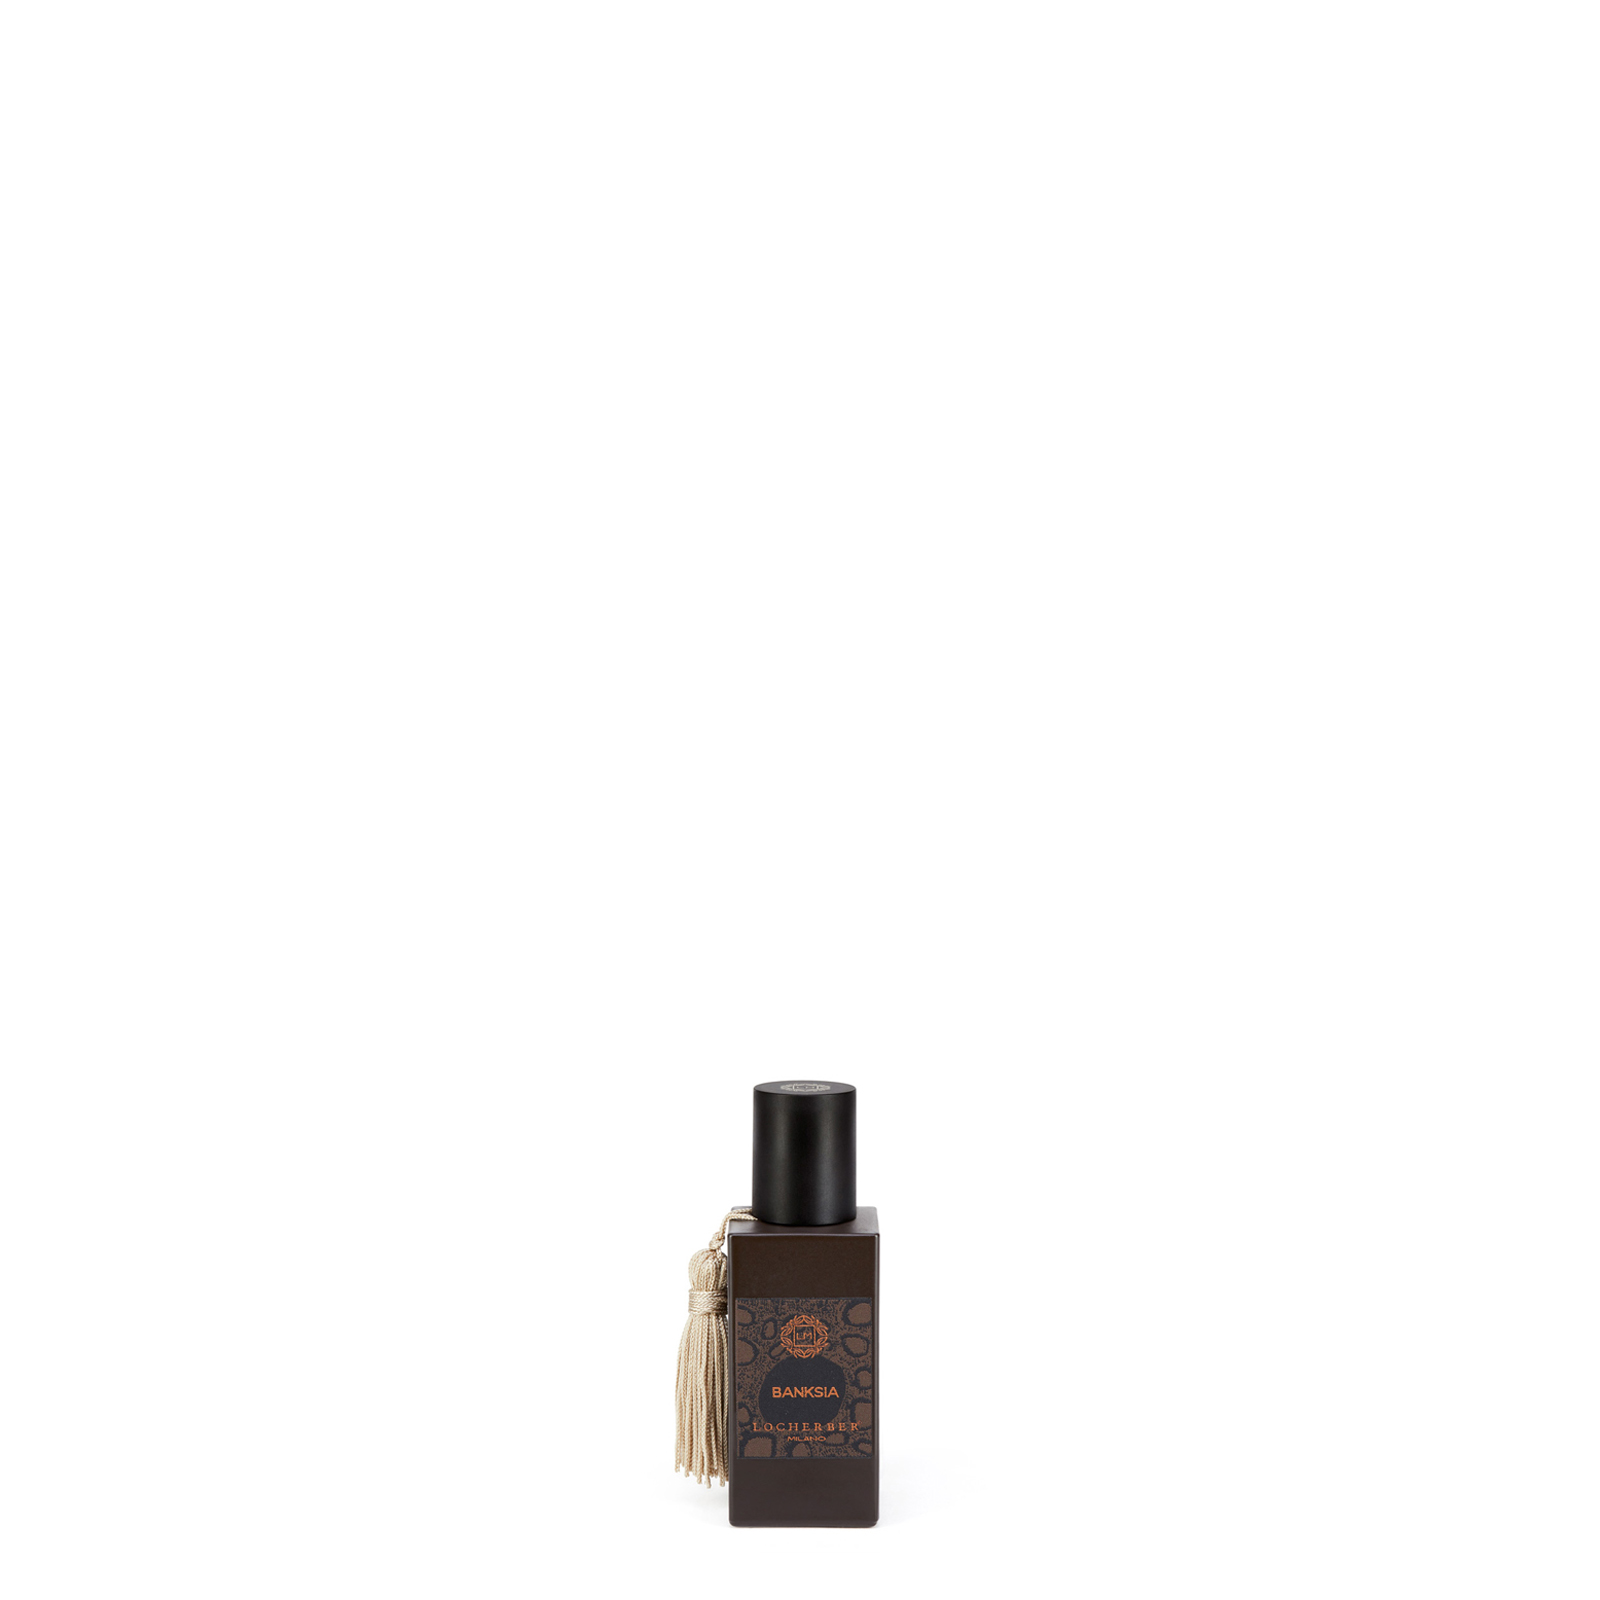 Locherber Milano - Banksia - Eau de Parfum 50 ml